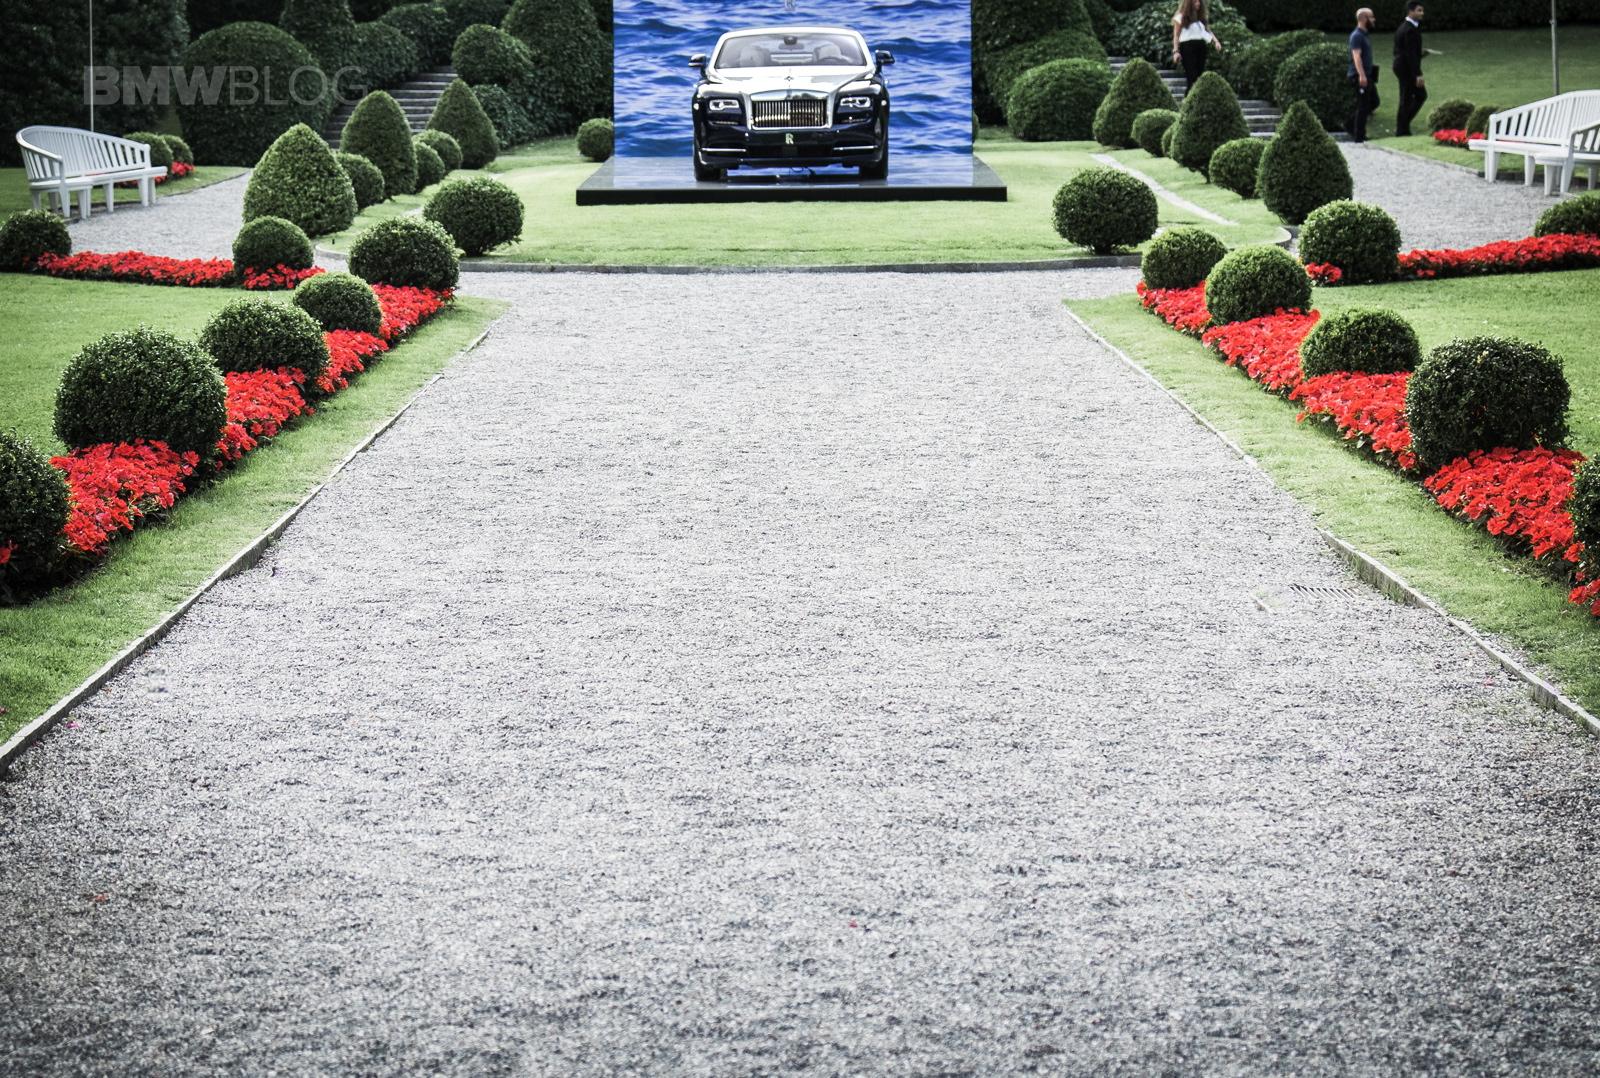 Rolls Royce Sweptail villa d este 26